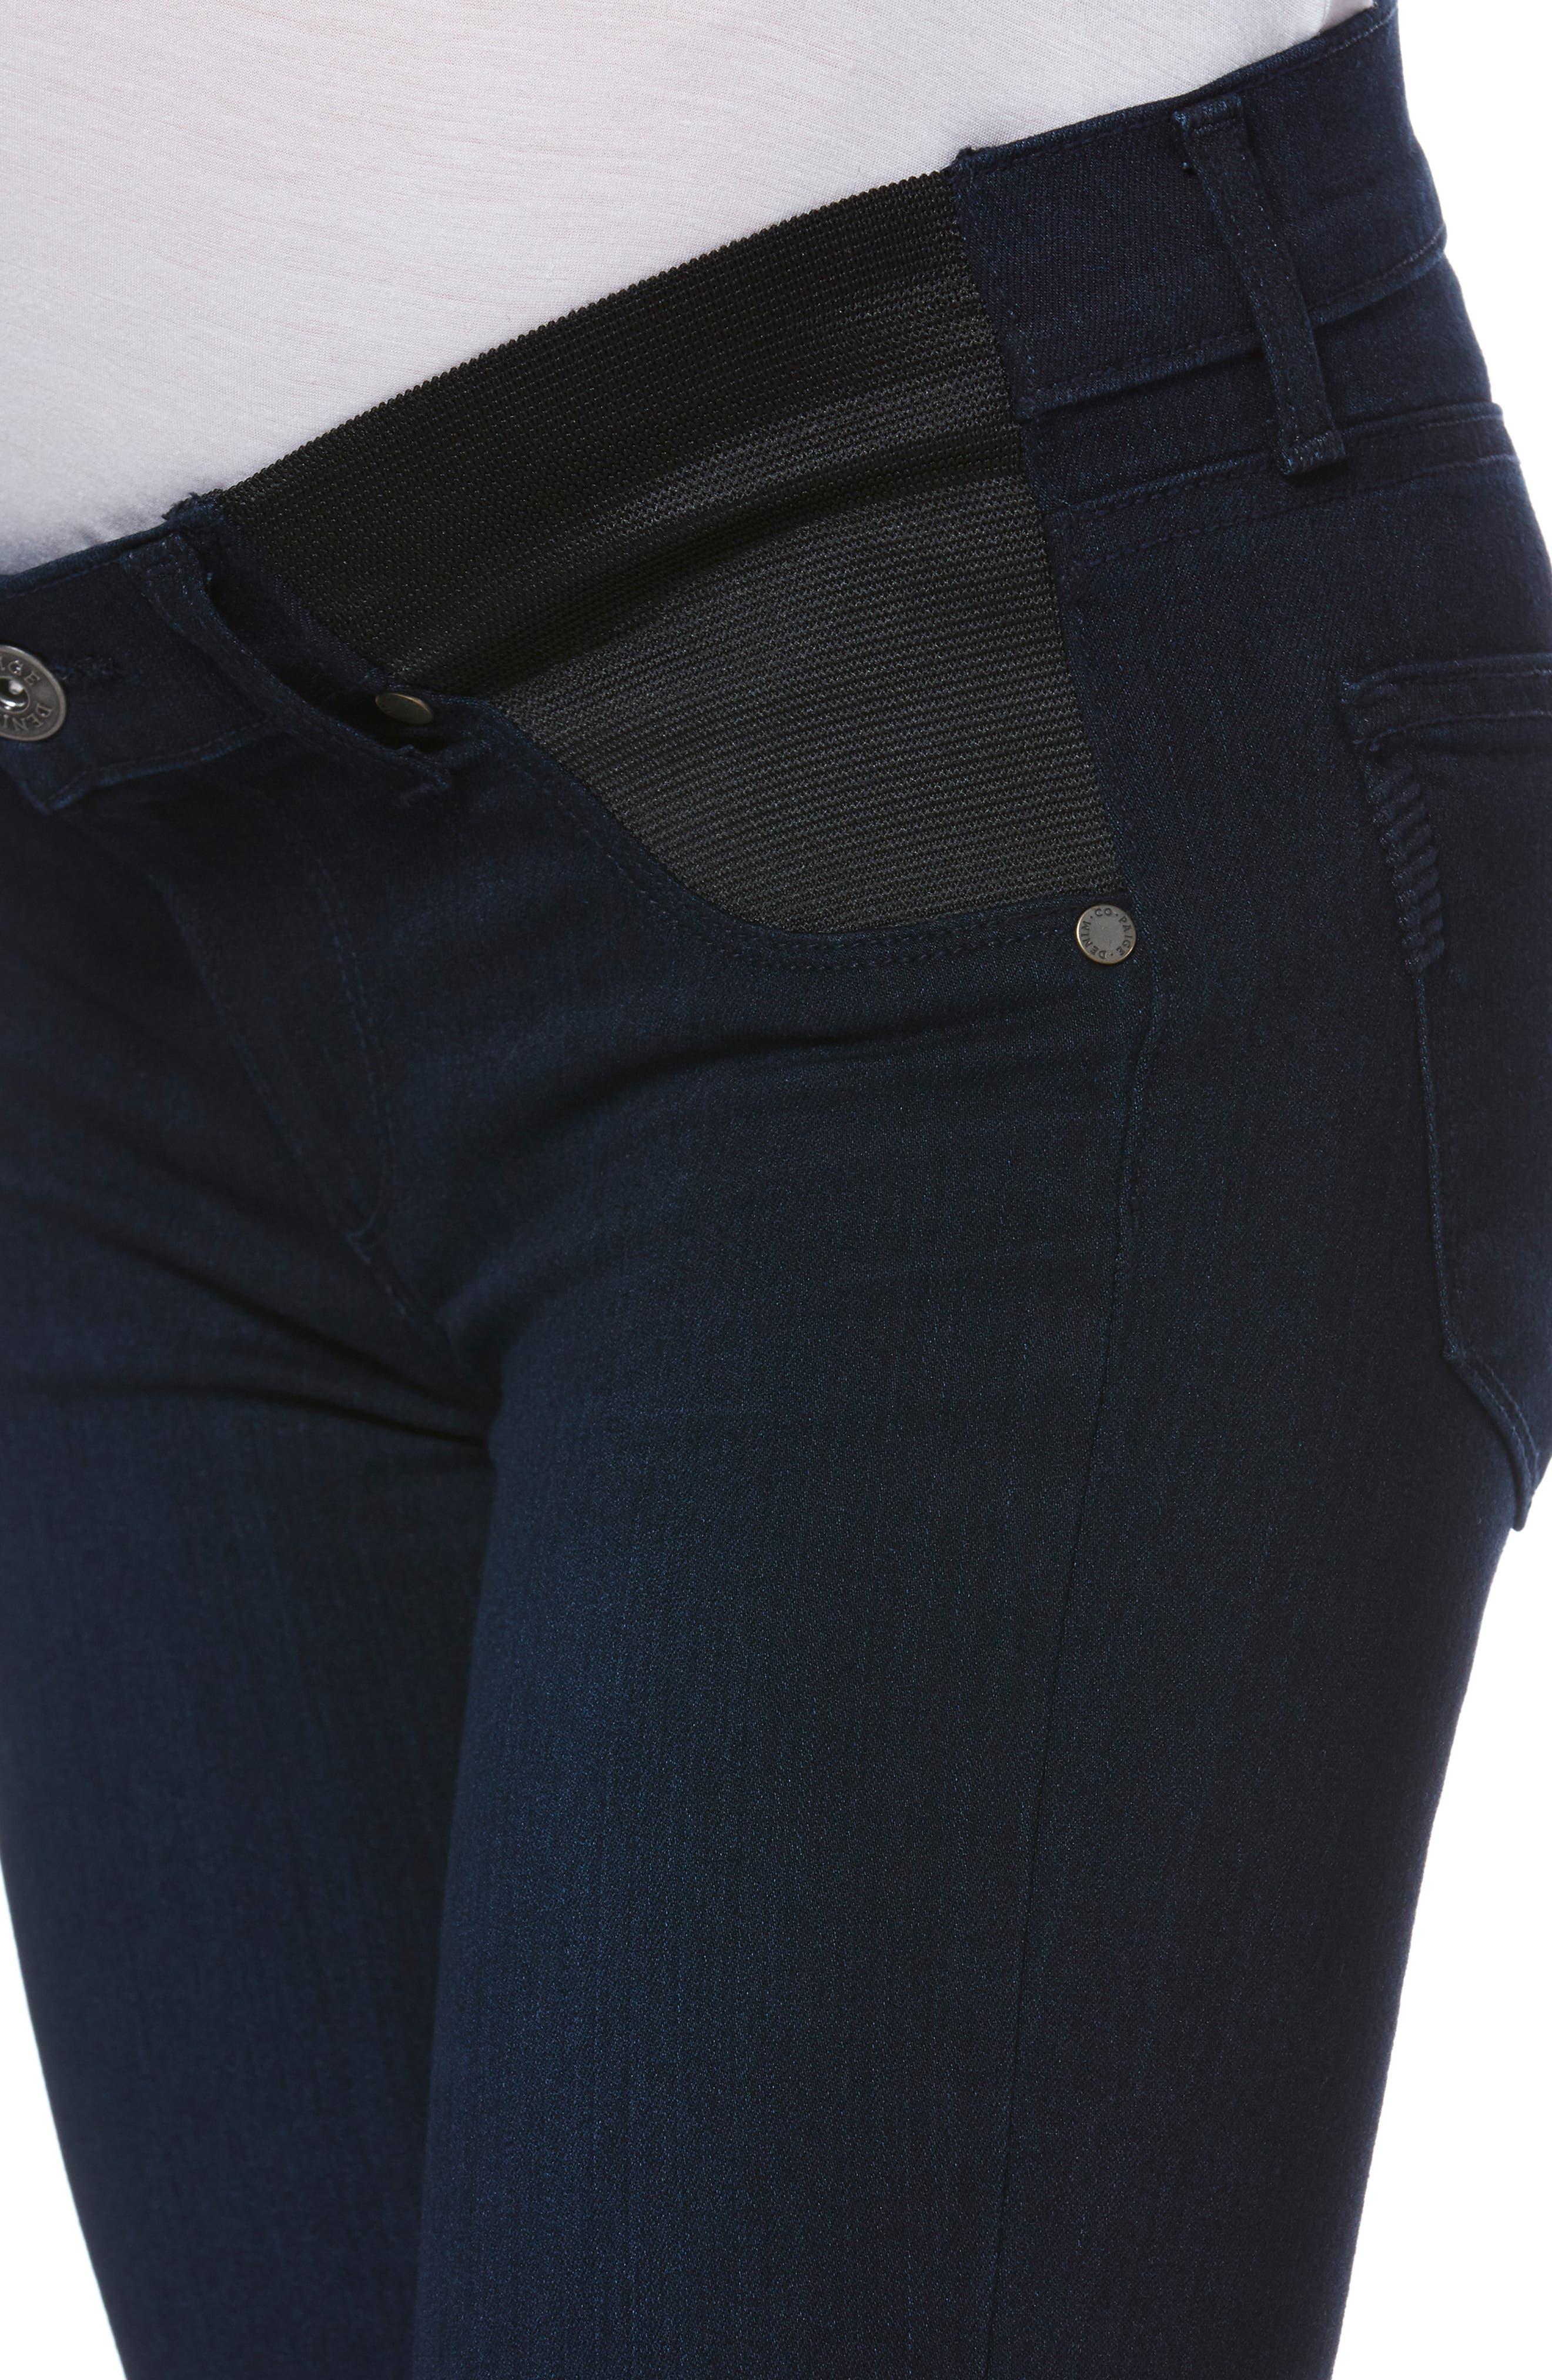 PAIGE,                             Transcend - Verdugo Ultra Skinny Maternity Jeans,                             Alternate thumbnail 4, color,                             LANA